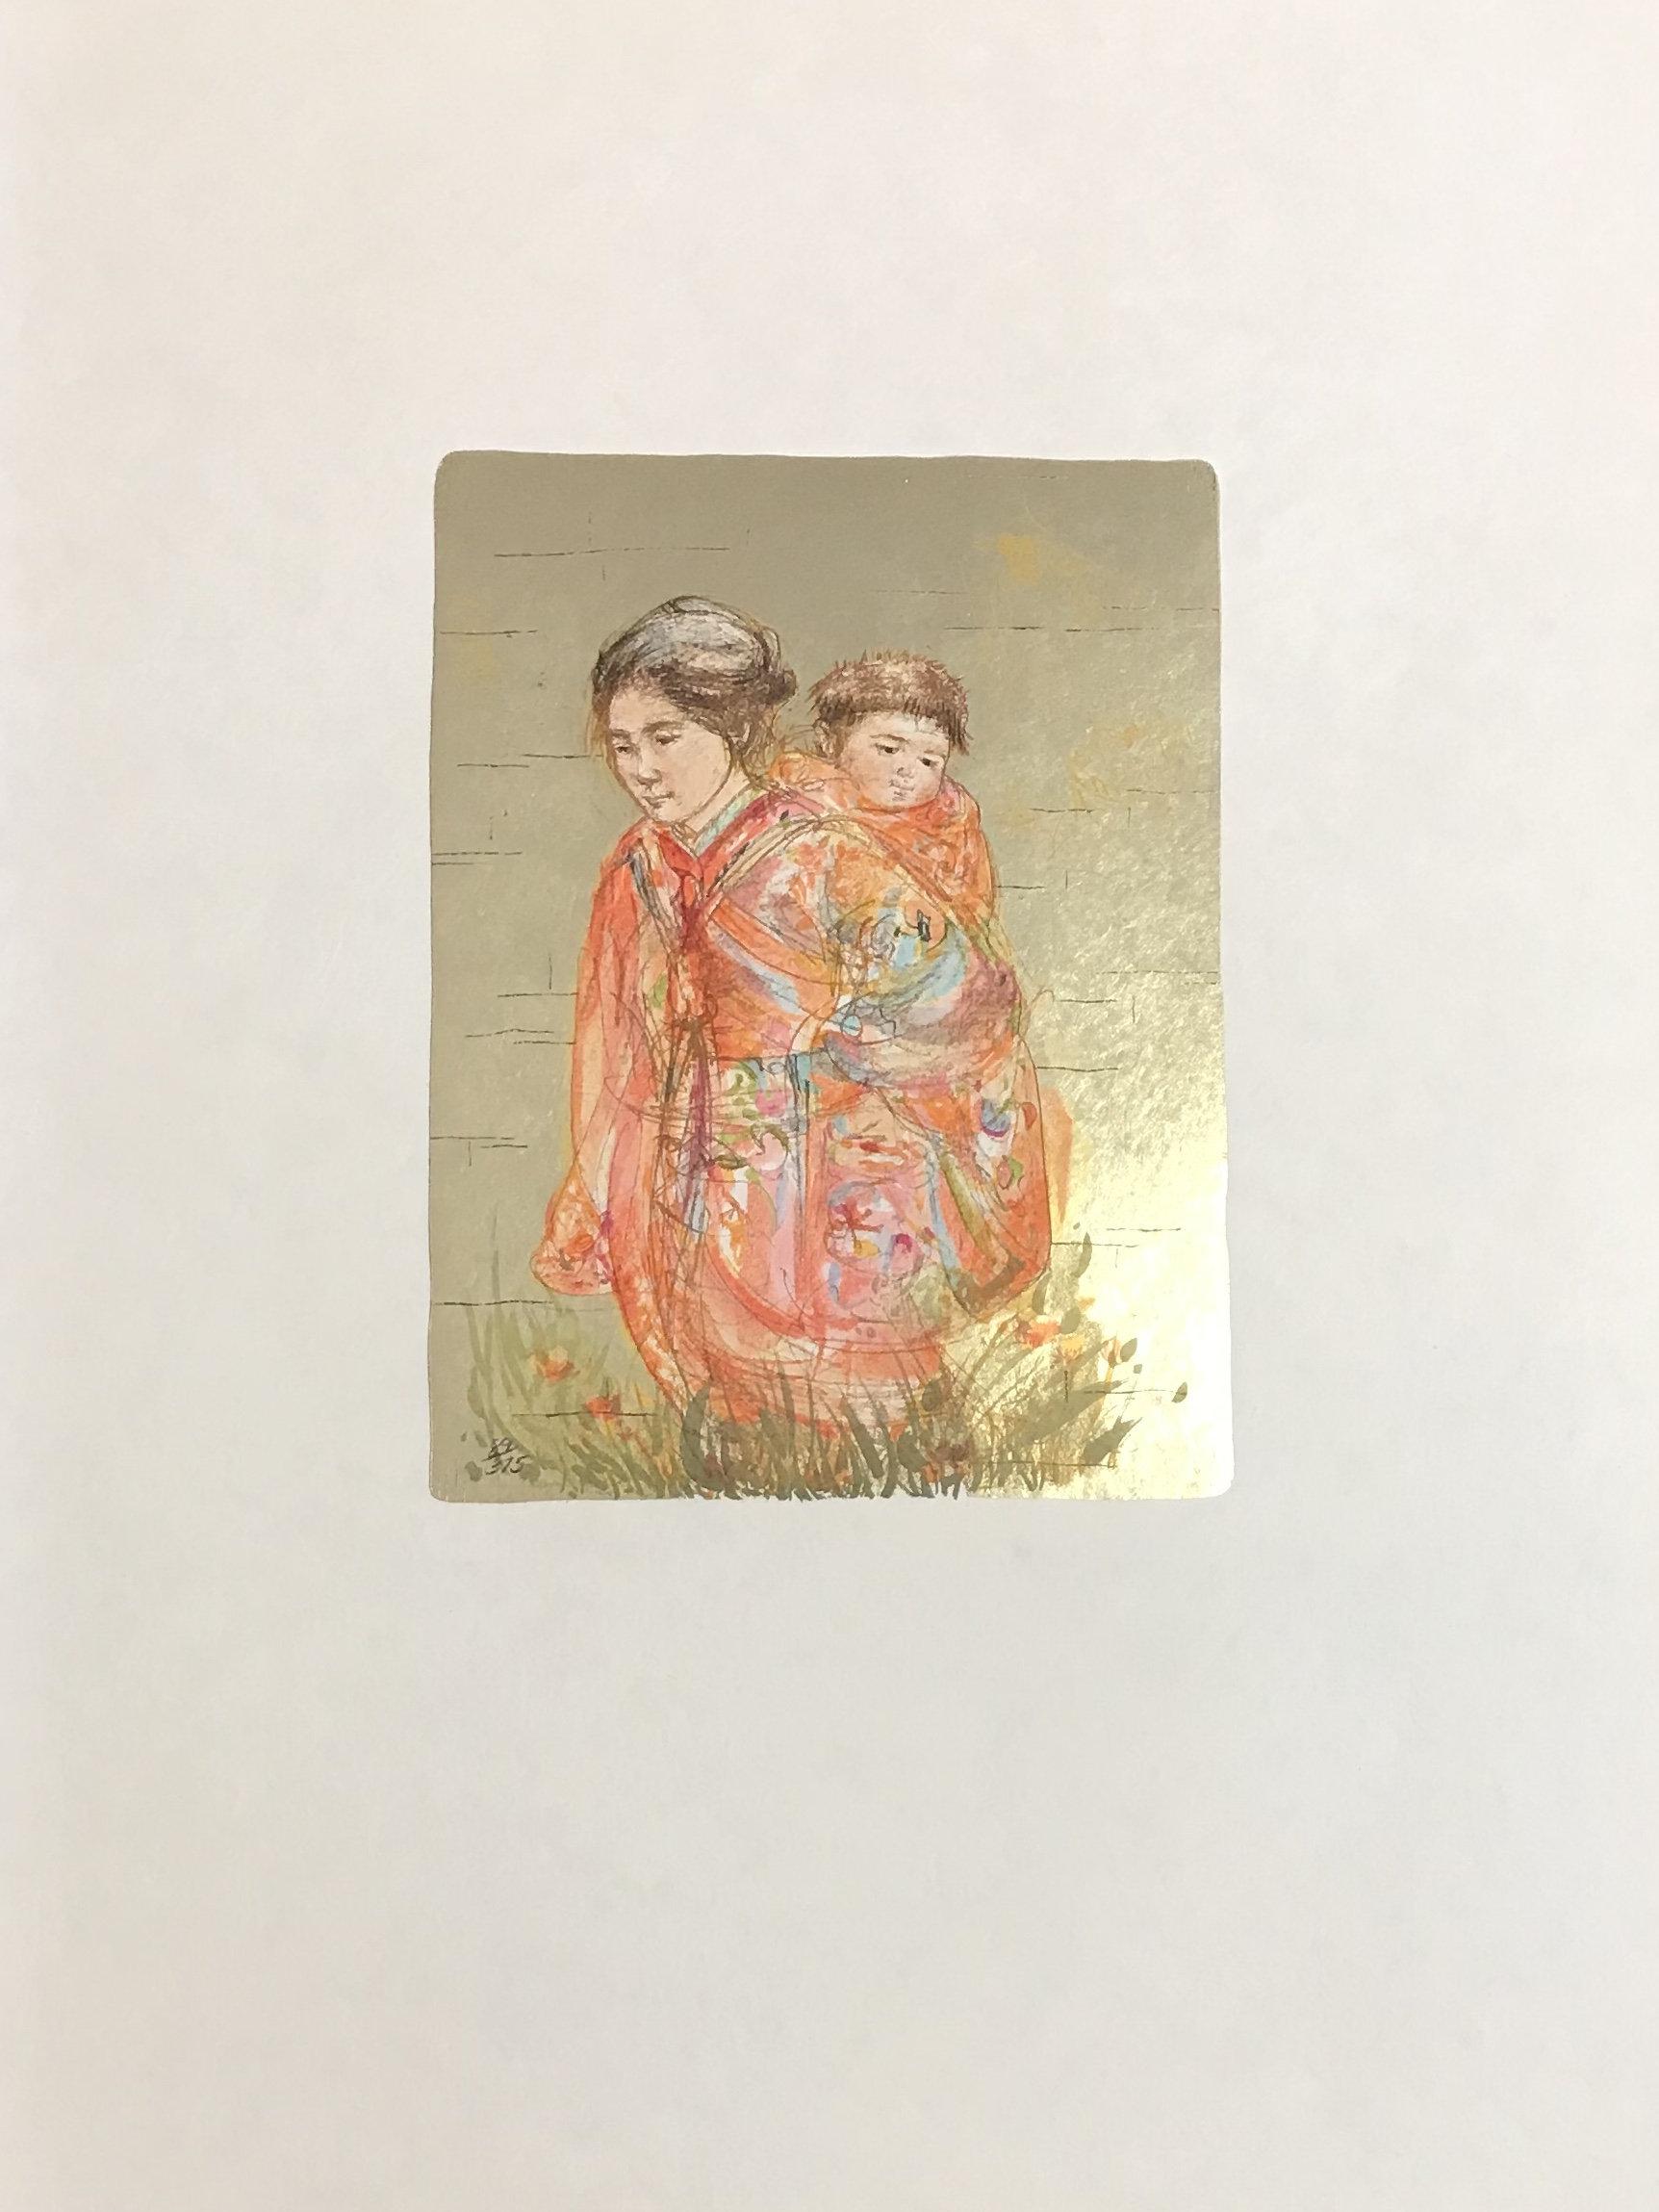 Edna Hibel, Okada to Kodomo, Pencil Signed Original Lithograph 1977